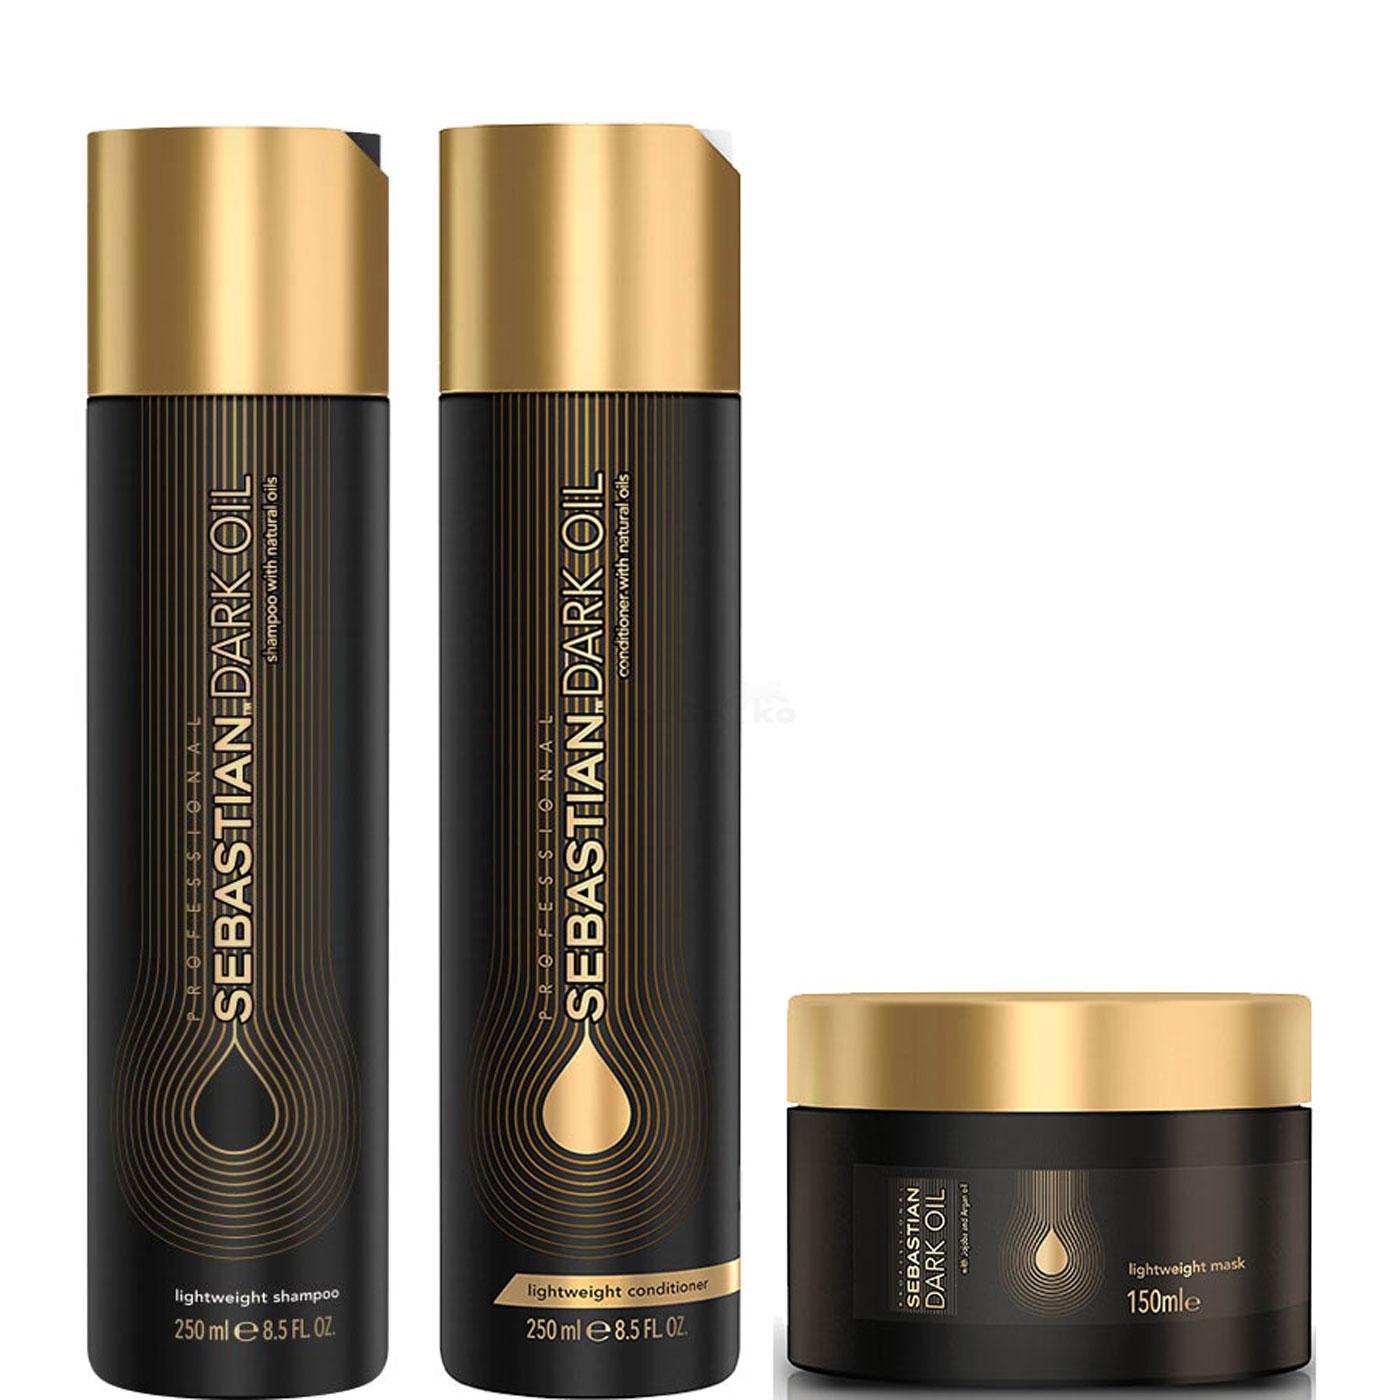 Sebastian Dark Oil Schwerelos Lightweight Set - Shampoo 250ml + Conditioner 250ml + Maske 150ml